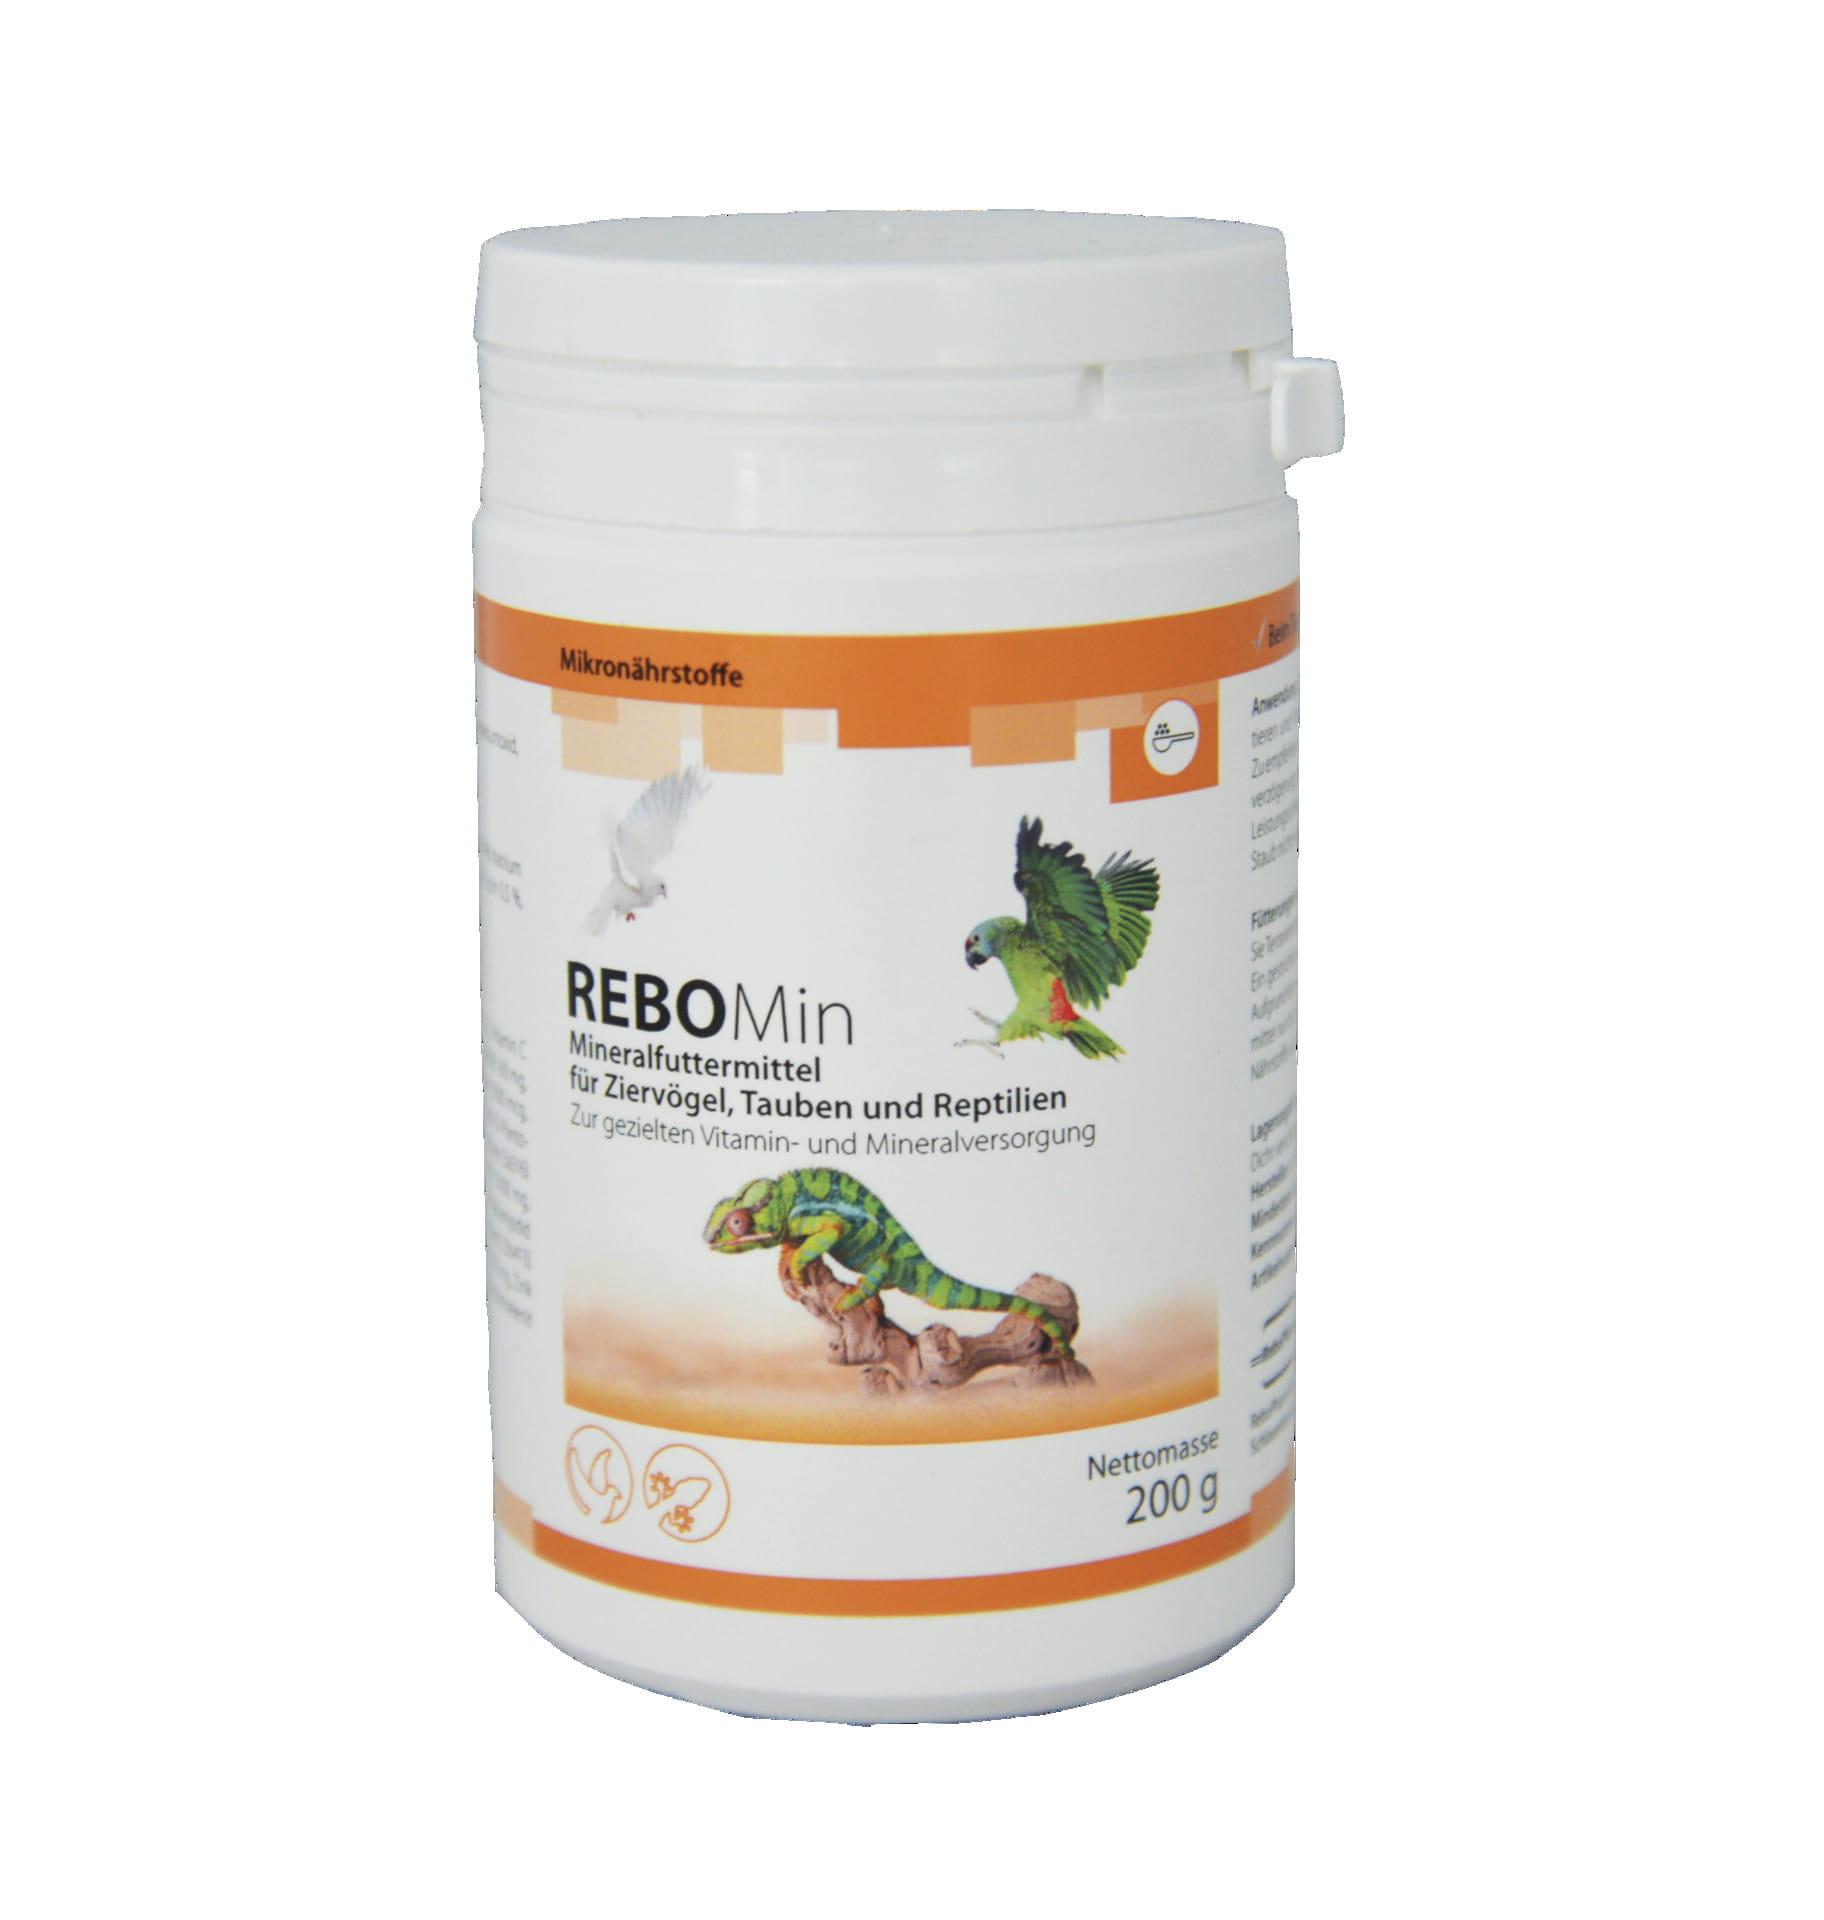 REBOMin Mineralfuttermittel